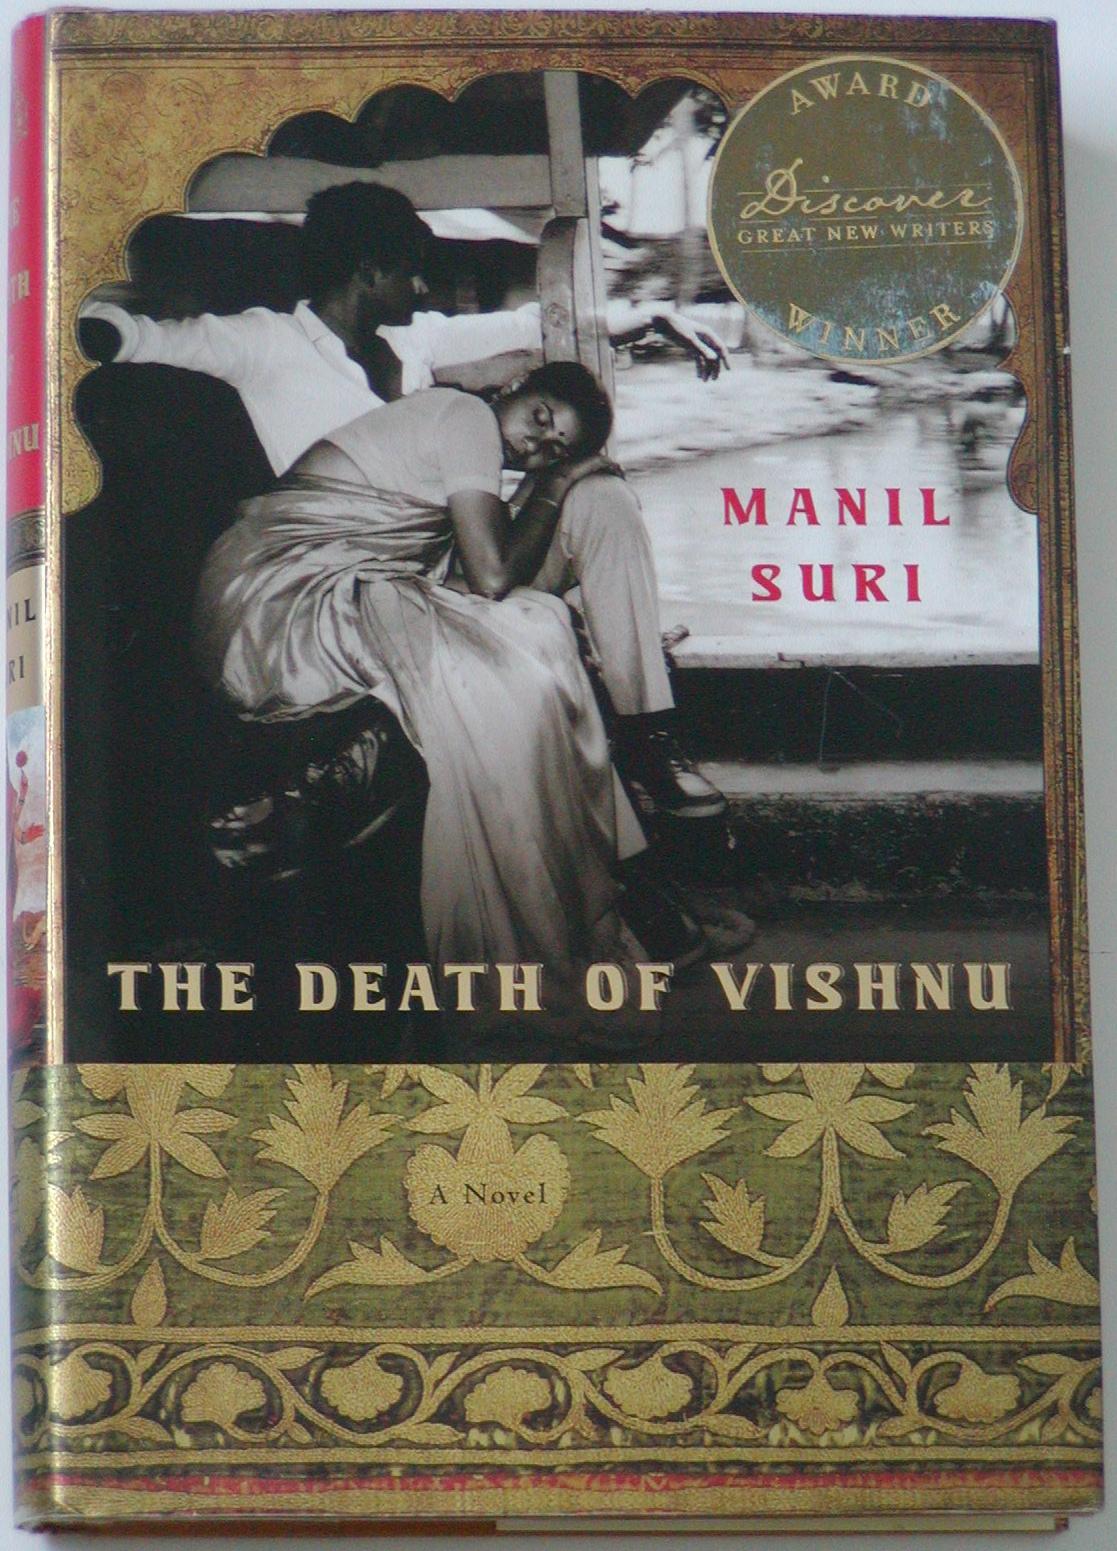 0393050424: Bookshop: Death of Visnu, Manil Suri